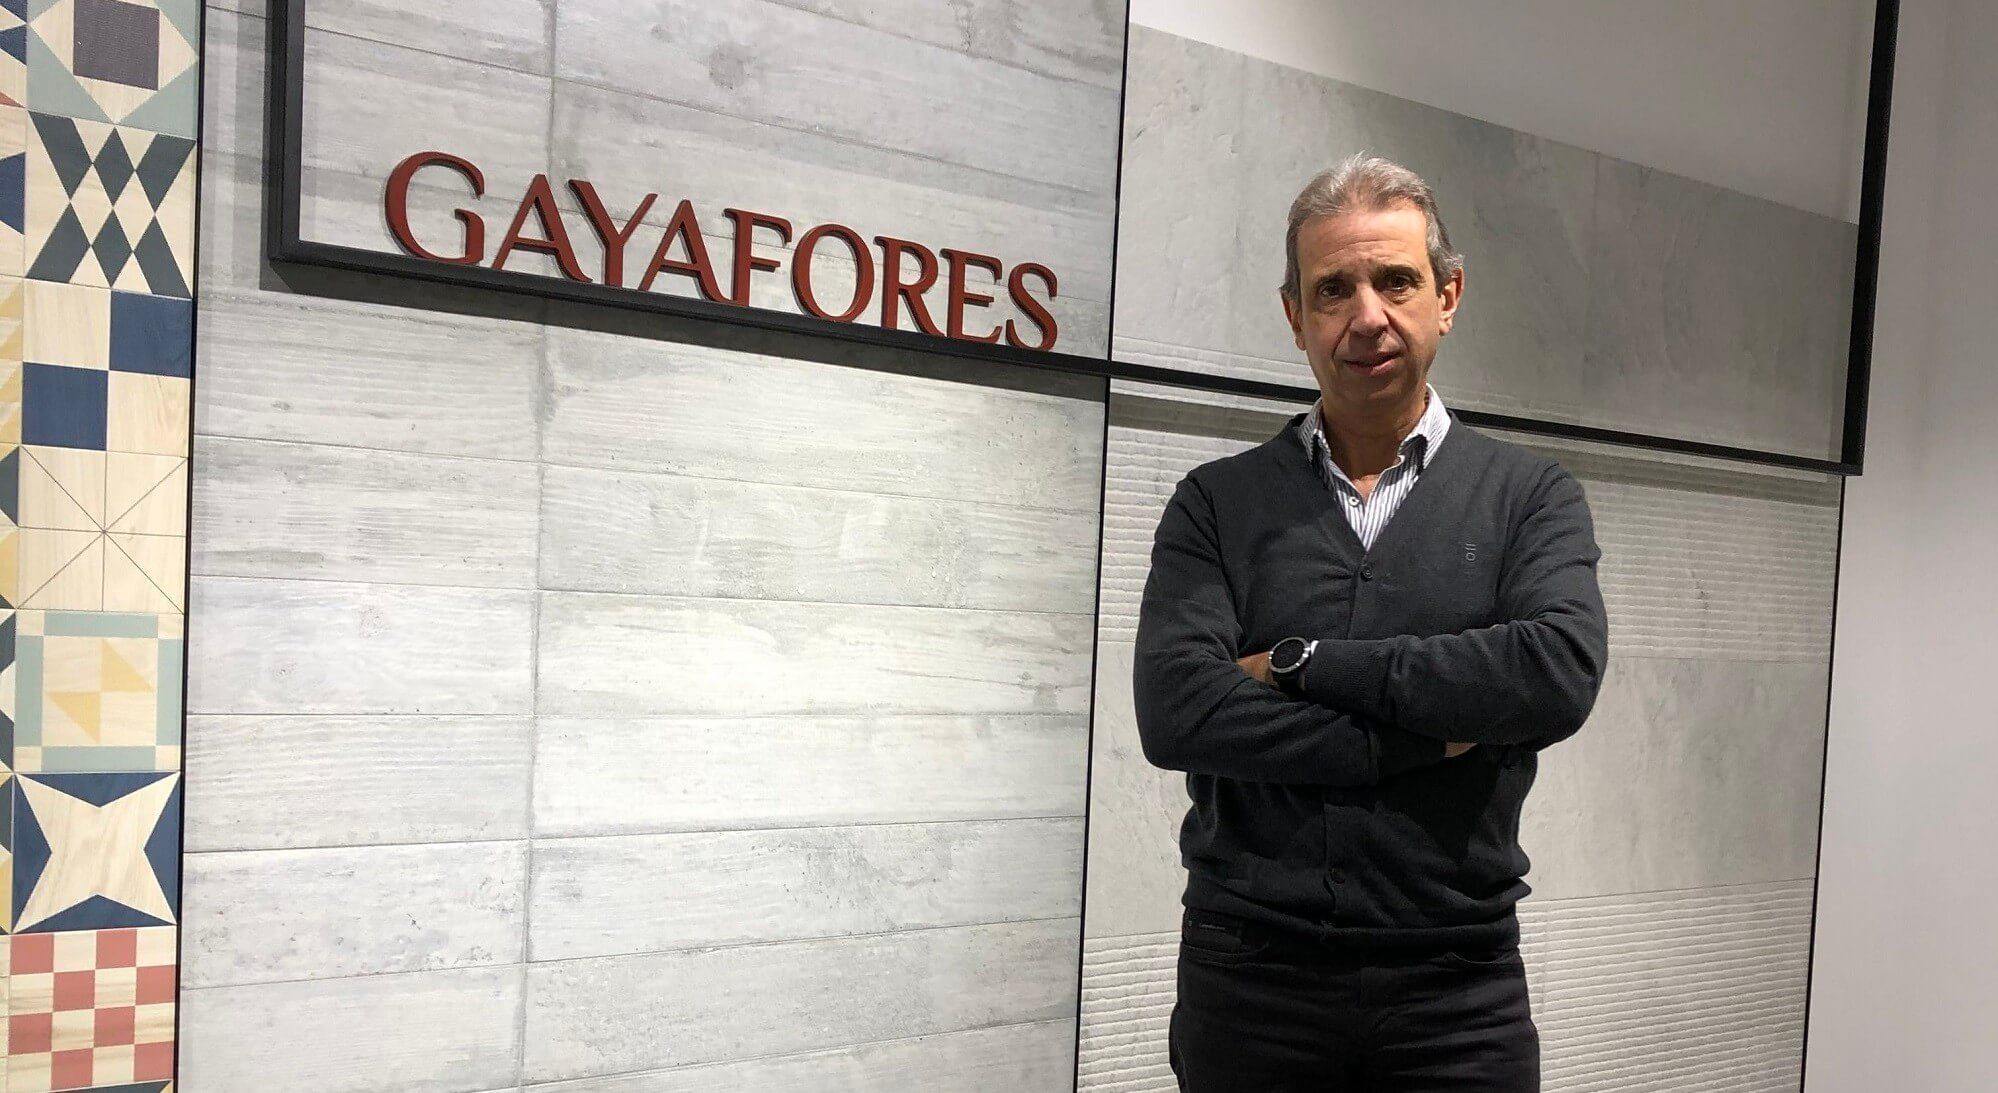 Aldo Patrone, Gayafores Export Manager